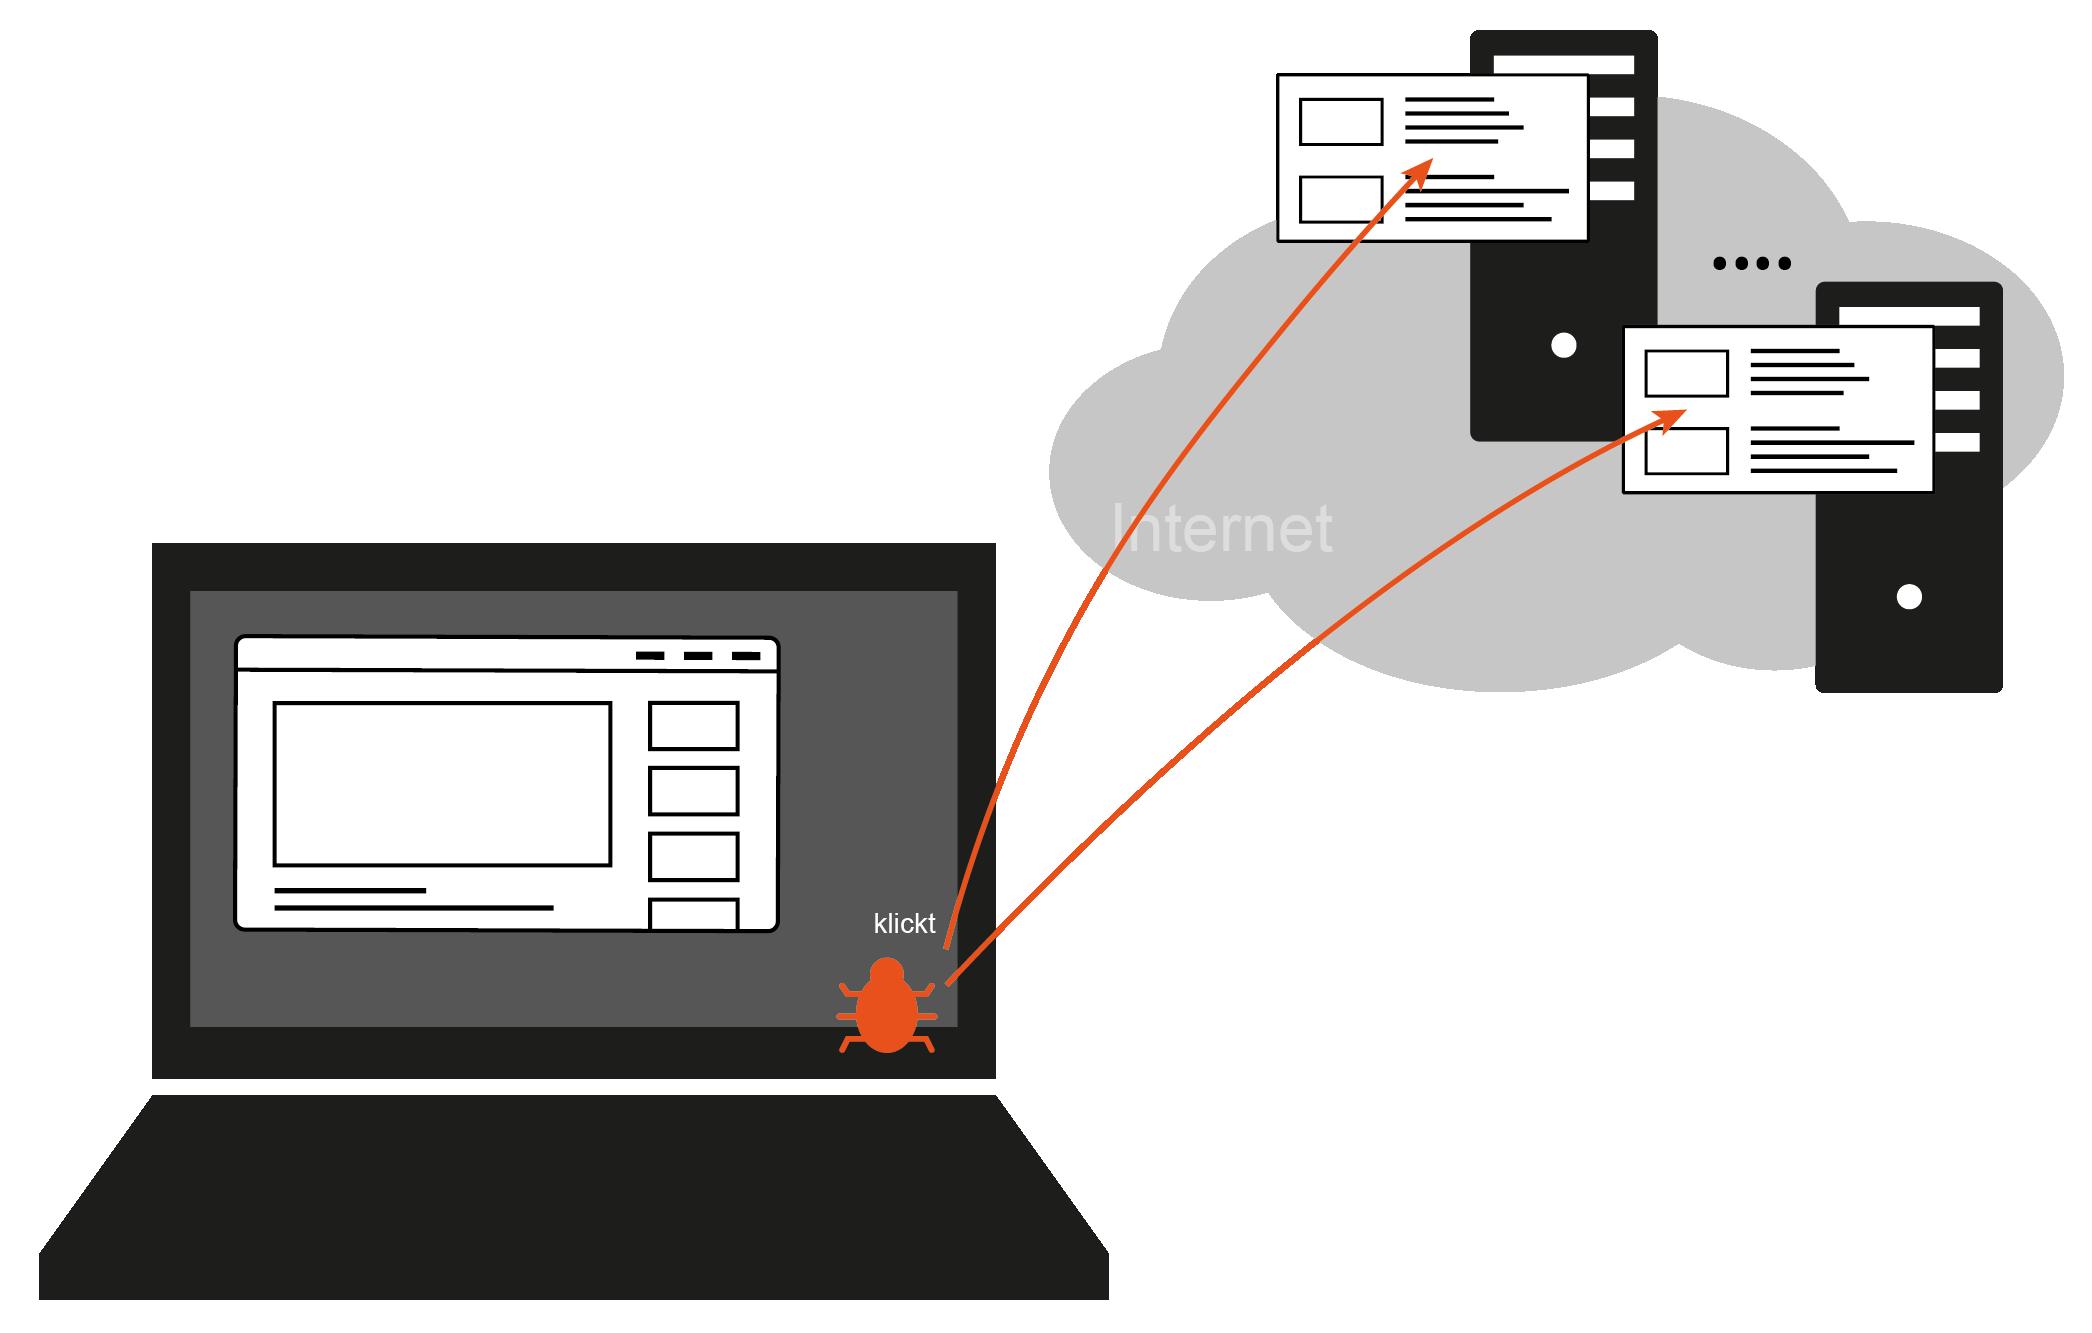 Click-Fraud-Malware / Klickbetrug-Schadsoftware - Glossar Cyber-Sicherheit - Prof. Norbert Pohlmann